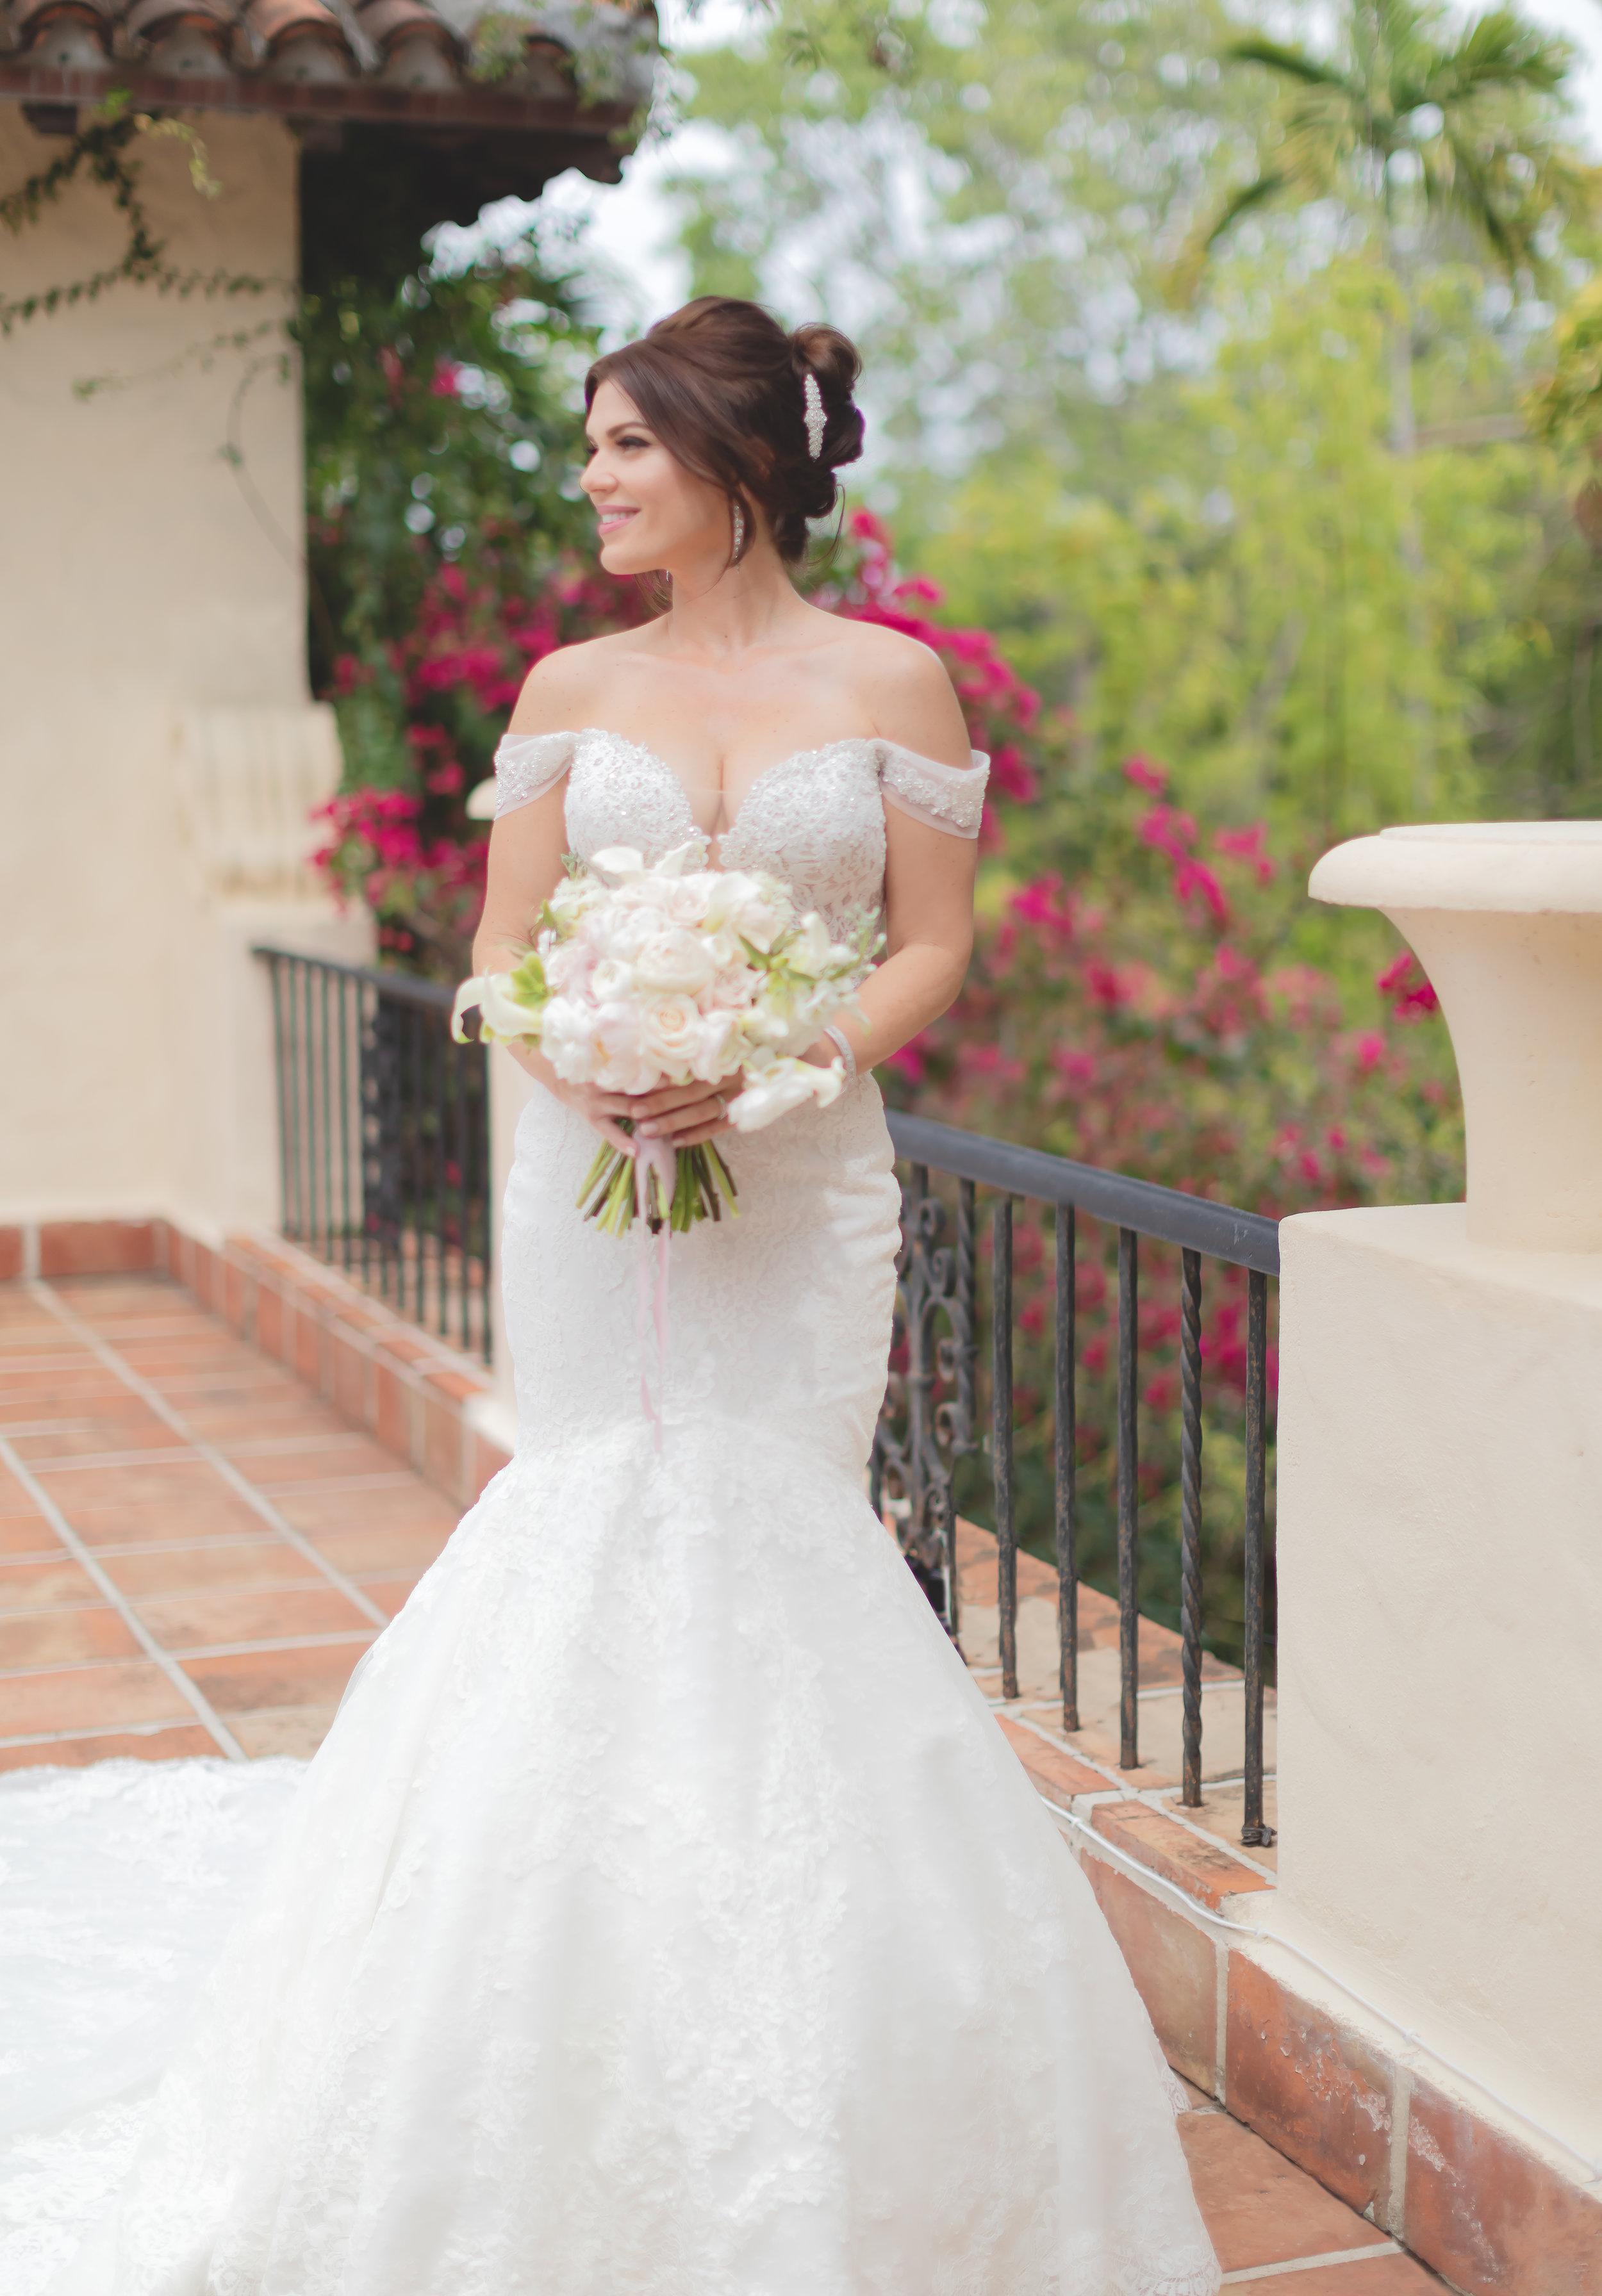 Romantic Wedding Villa Woodbine - Miami Wedding Photographer